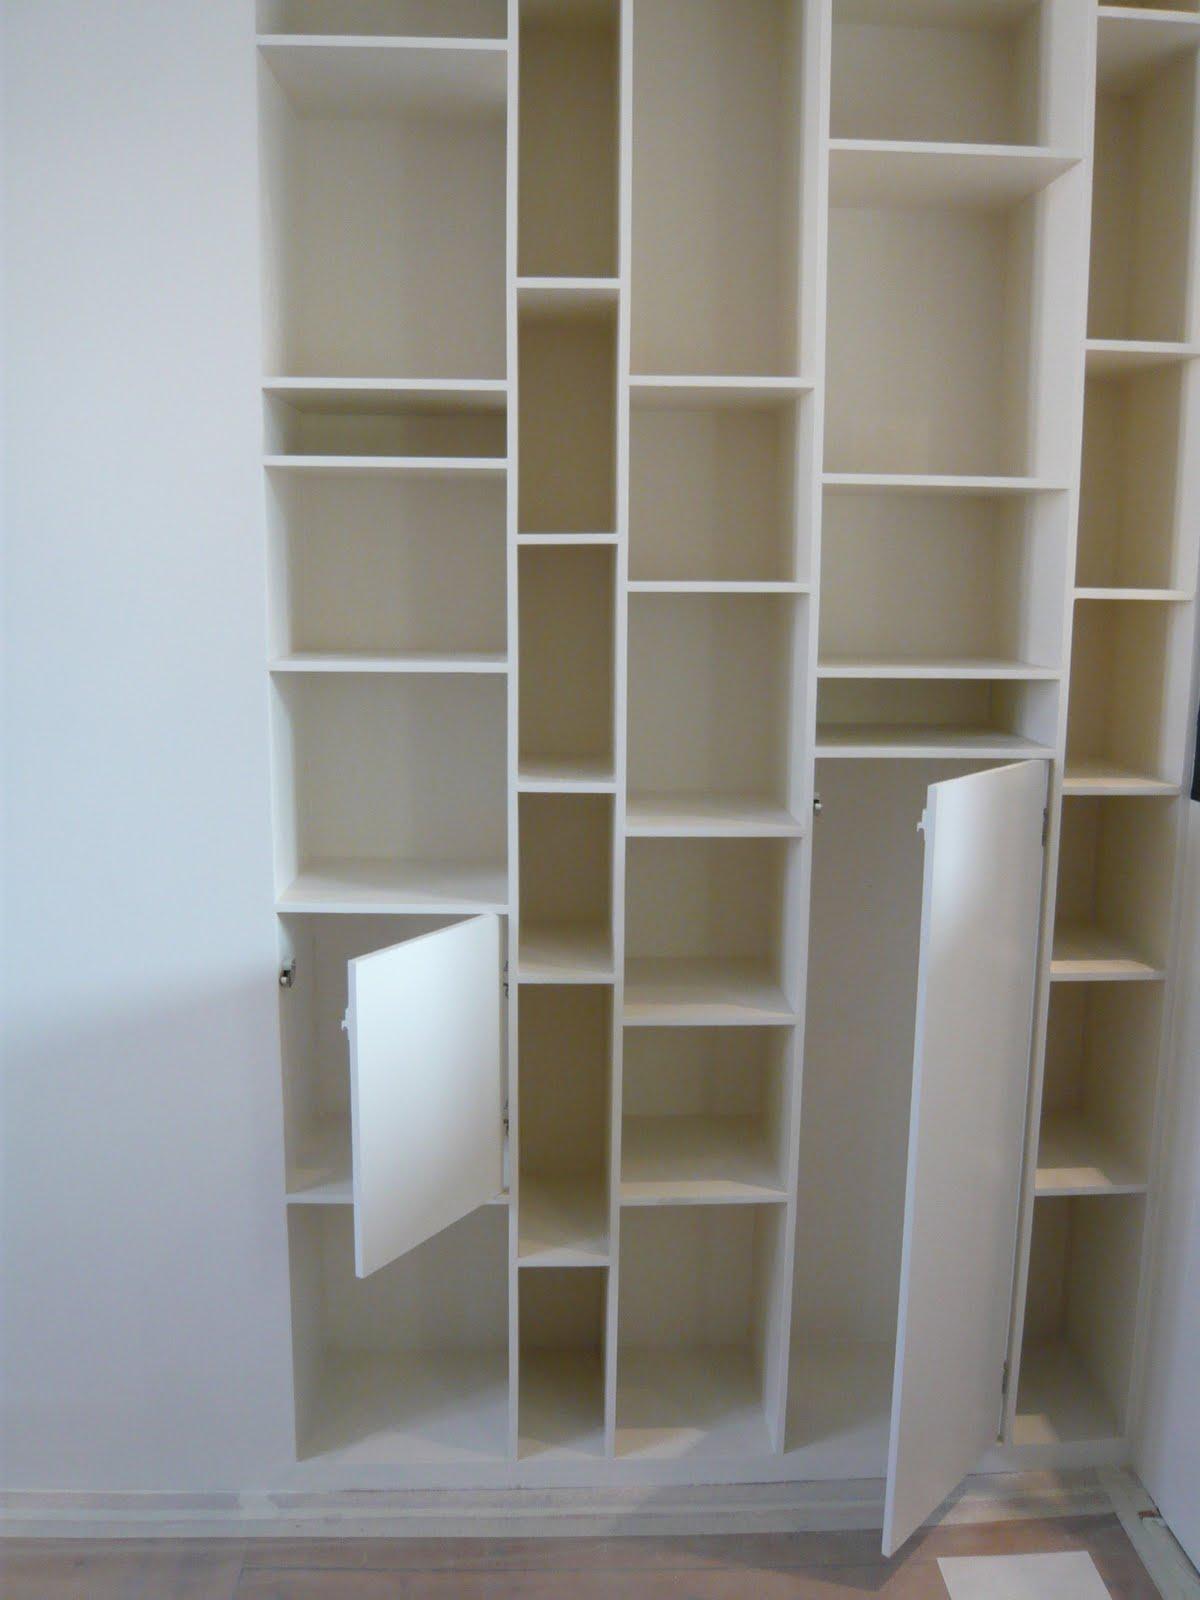 Bo travo concept verri re int rieure et biblioth que sur - Bibliotheque sur mesure ikea ...